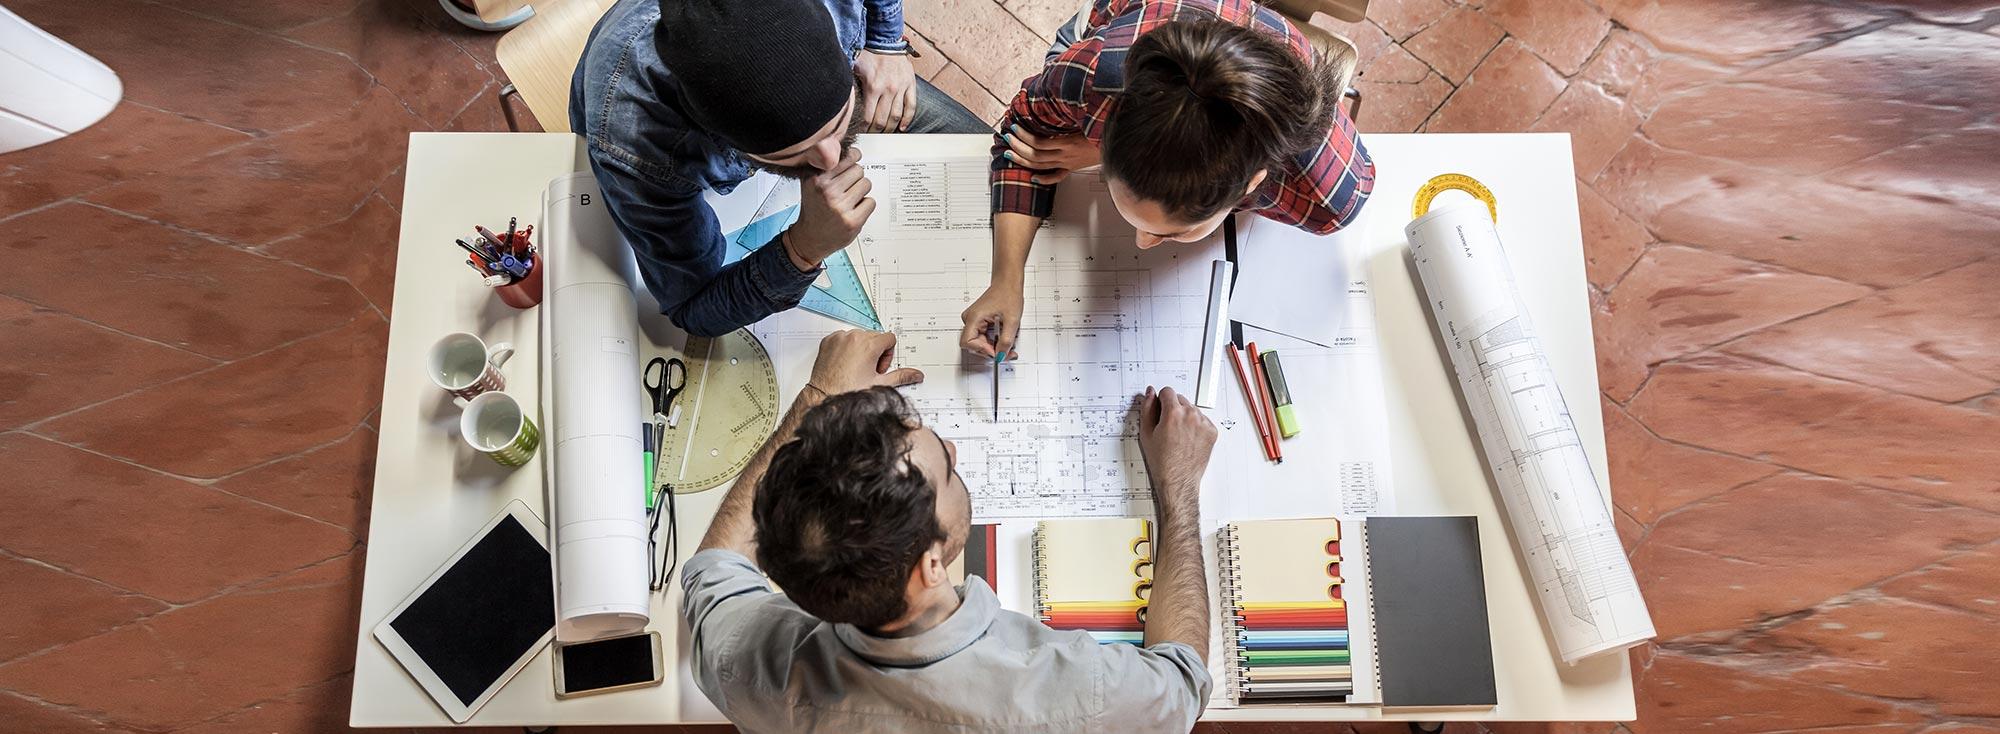 Job opportunities for OTs, Architect or Surveyor?